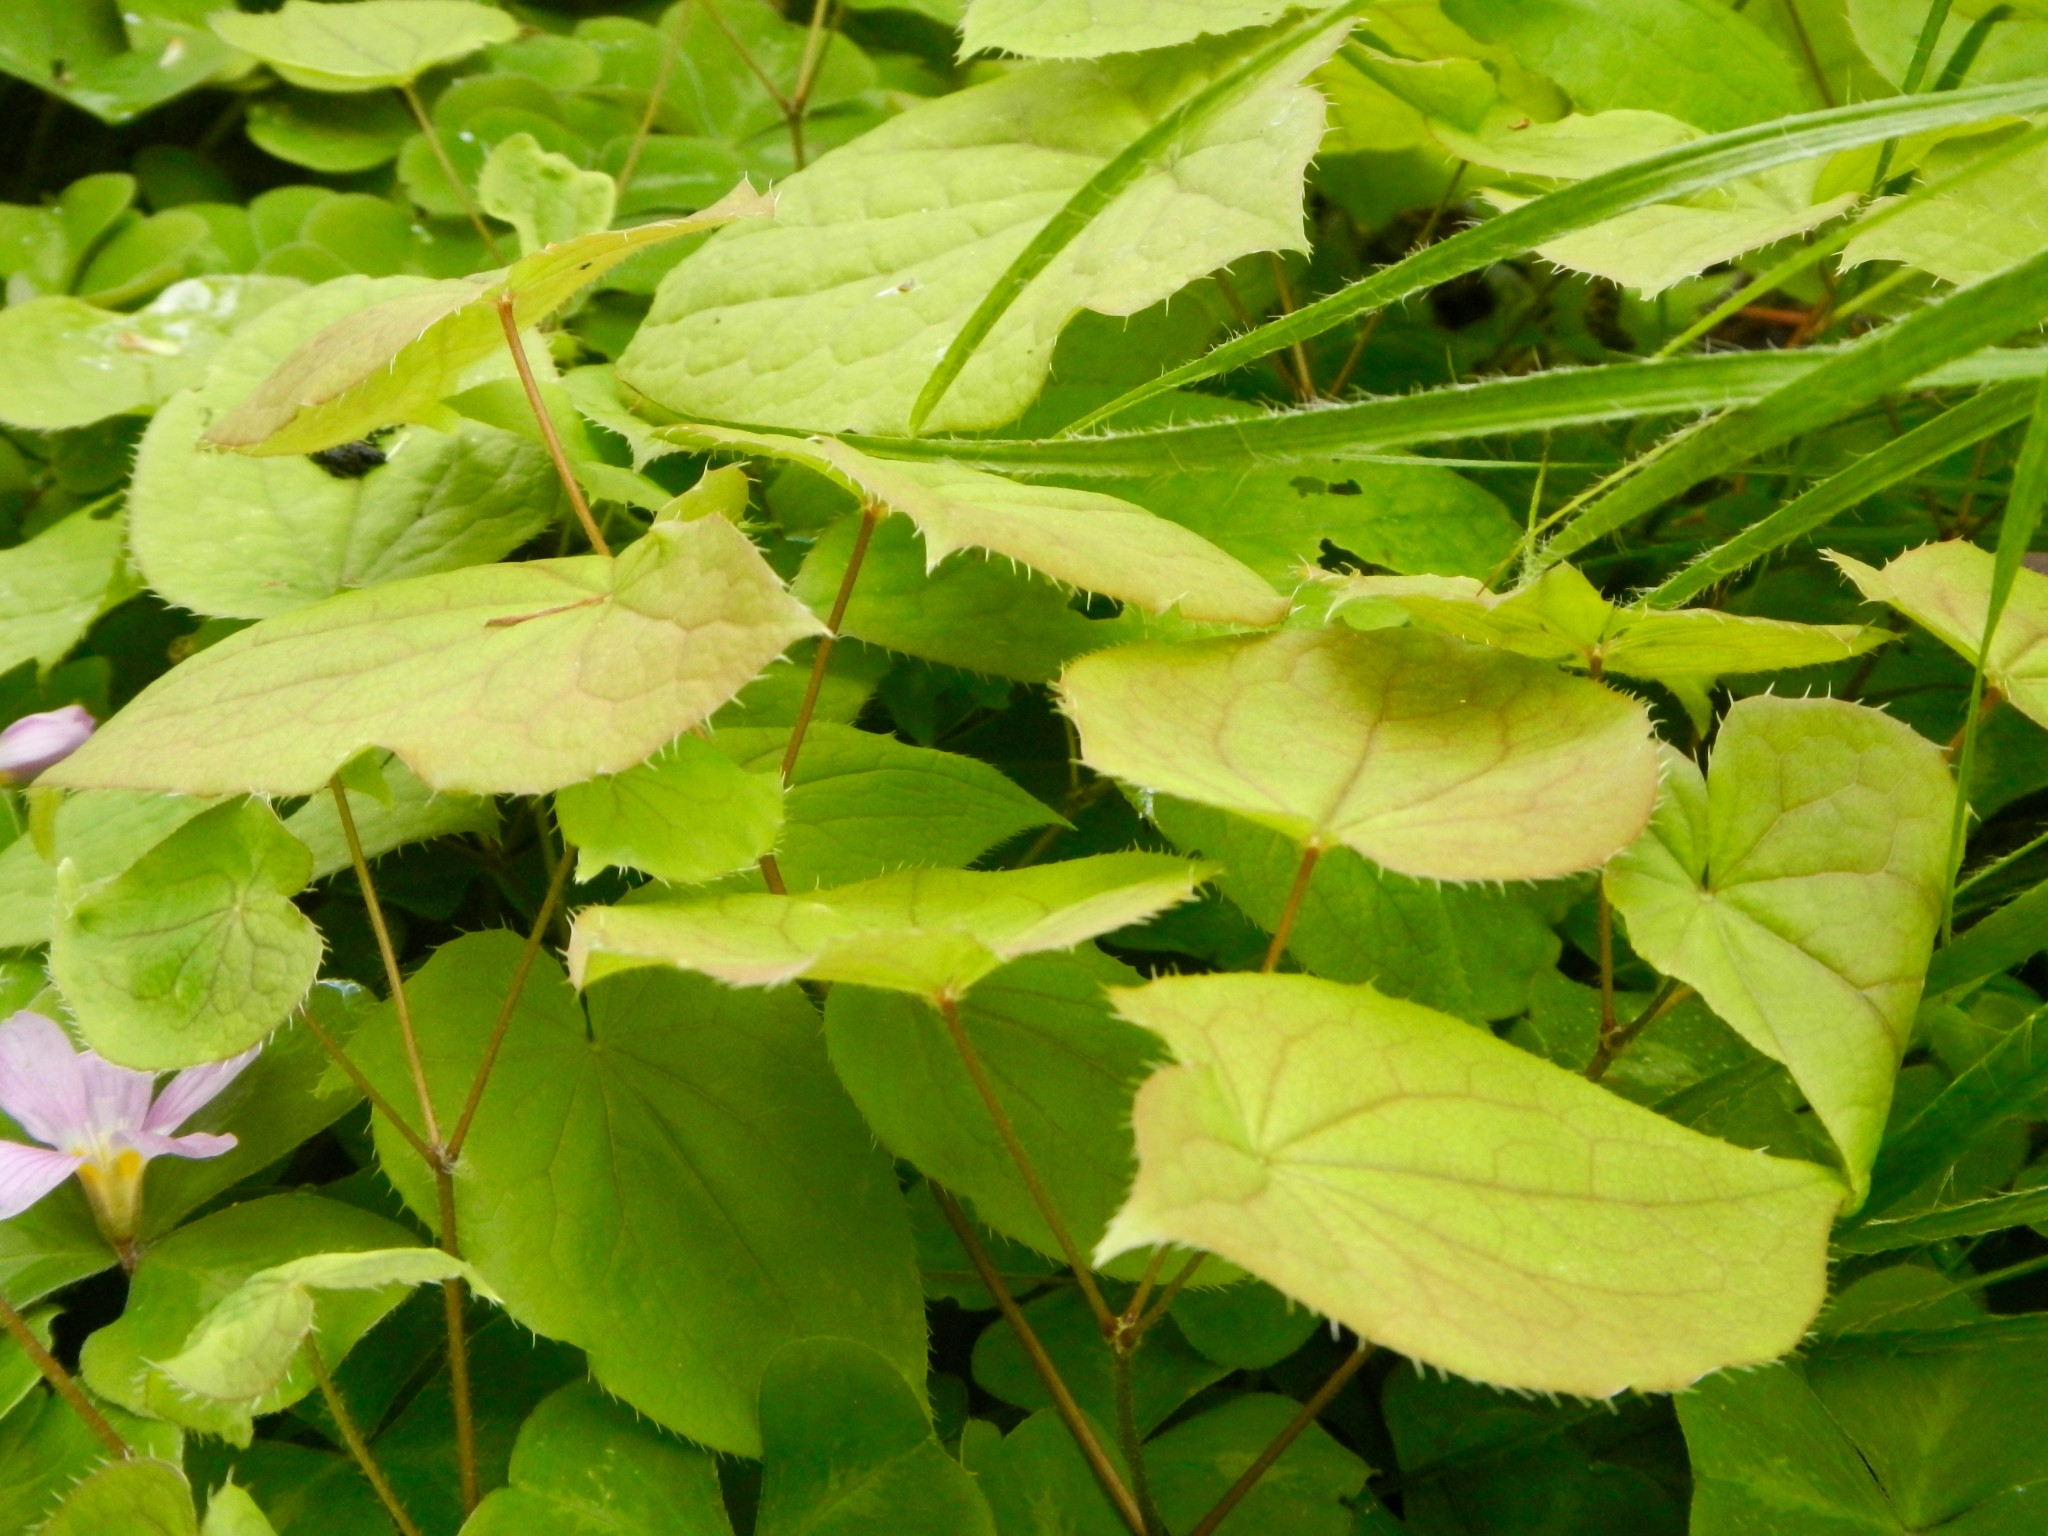 Many Epimediums dress in heart-shaped leaves. It's fairy-wing flowers are bonus.